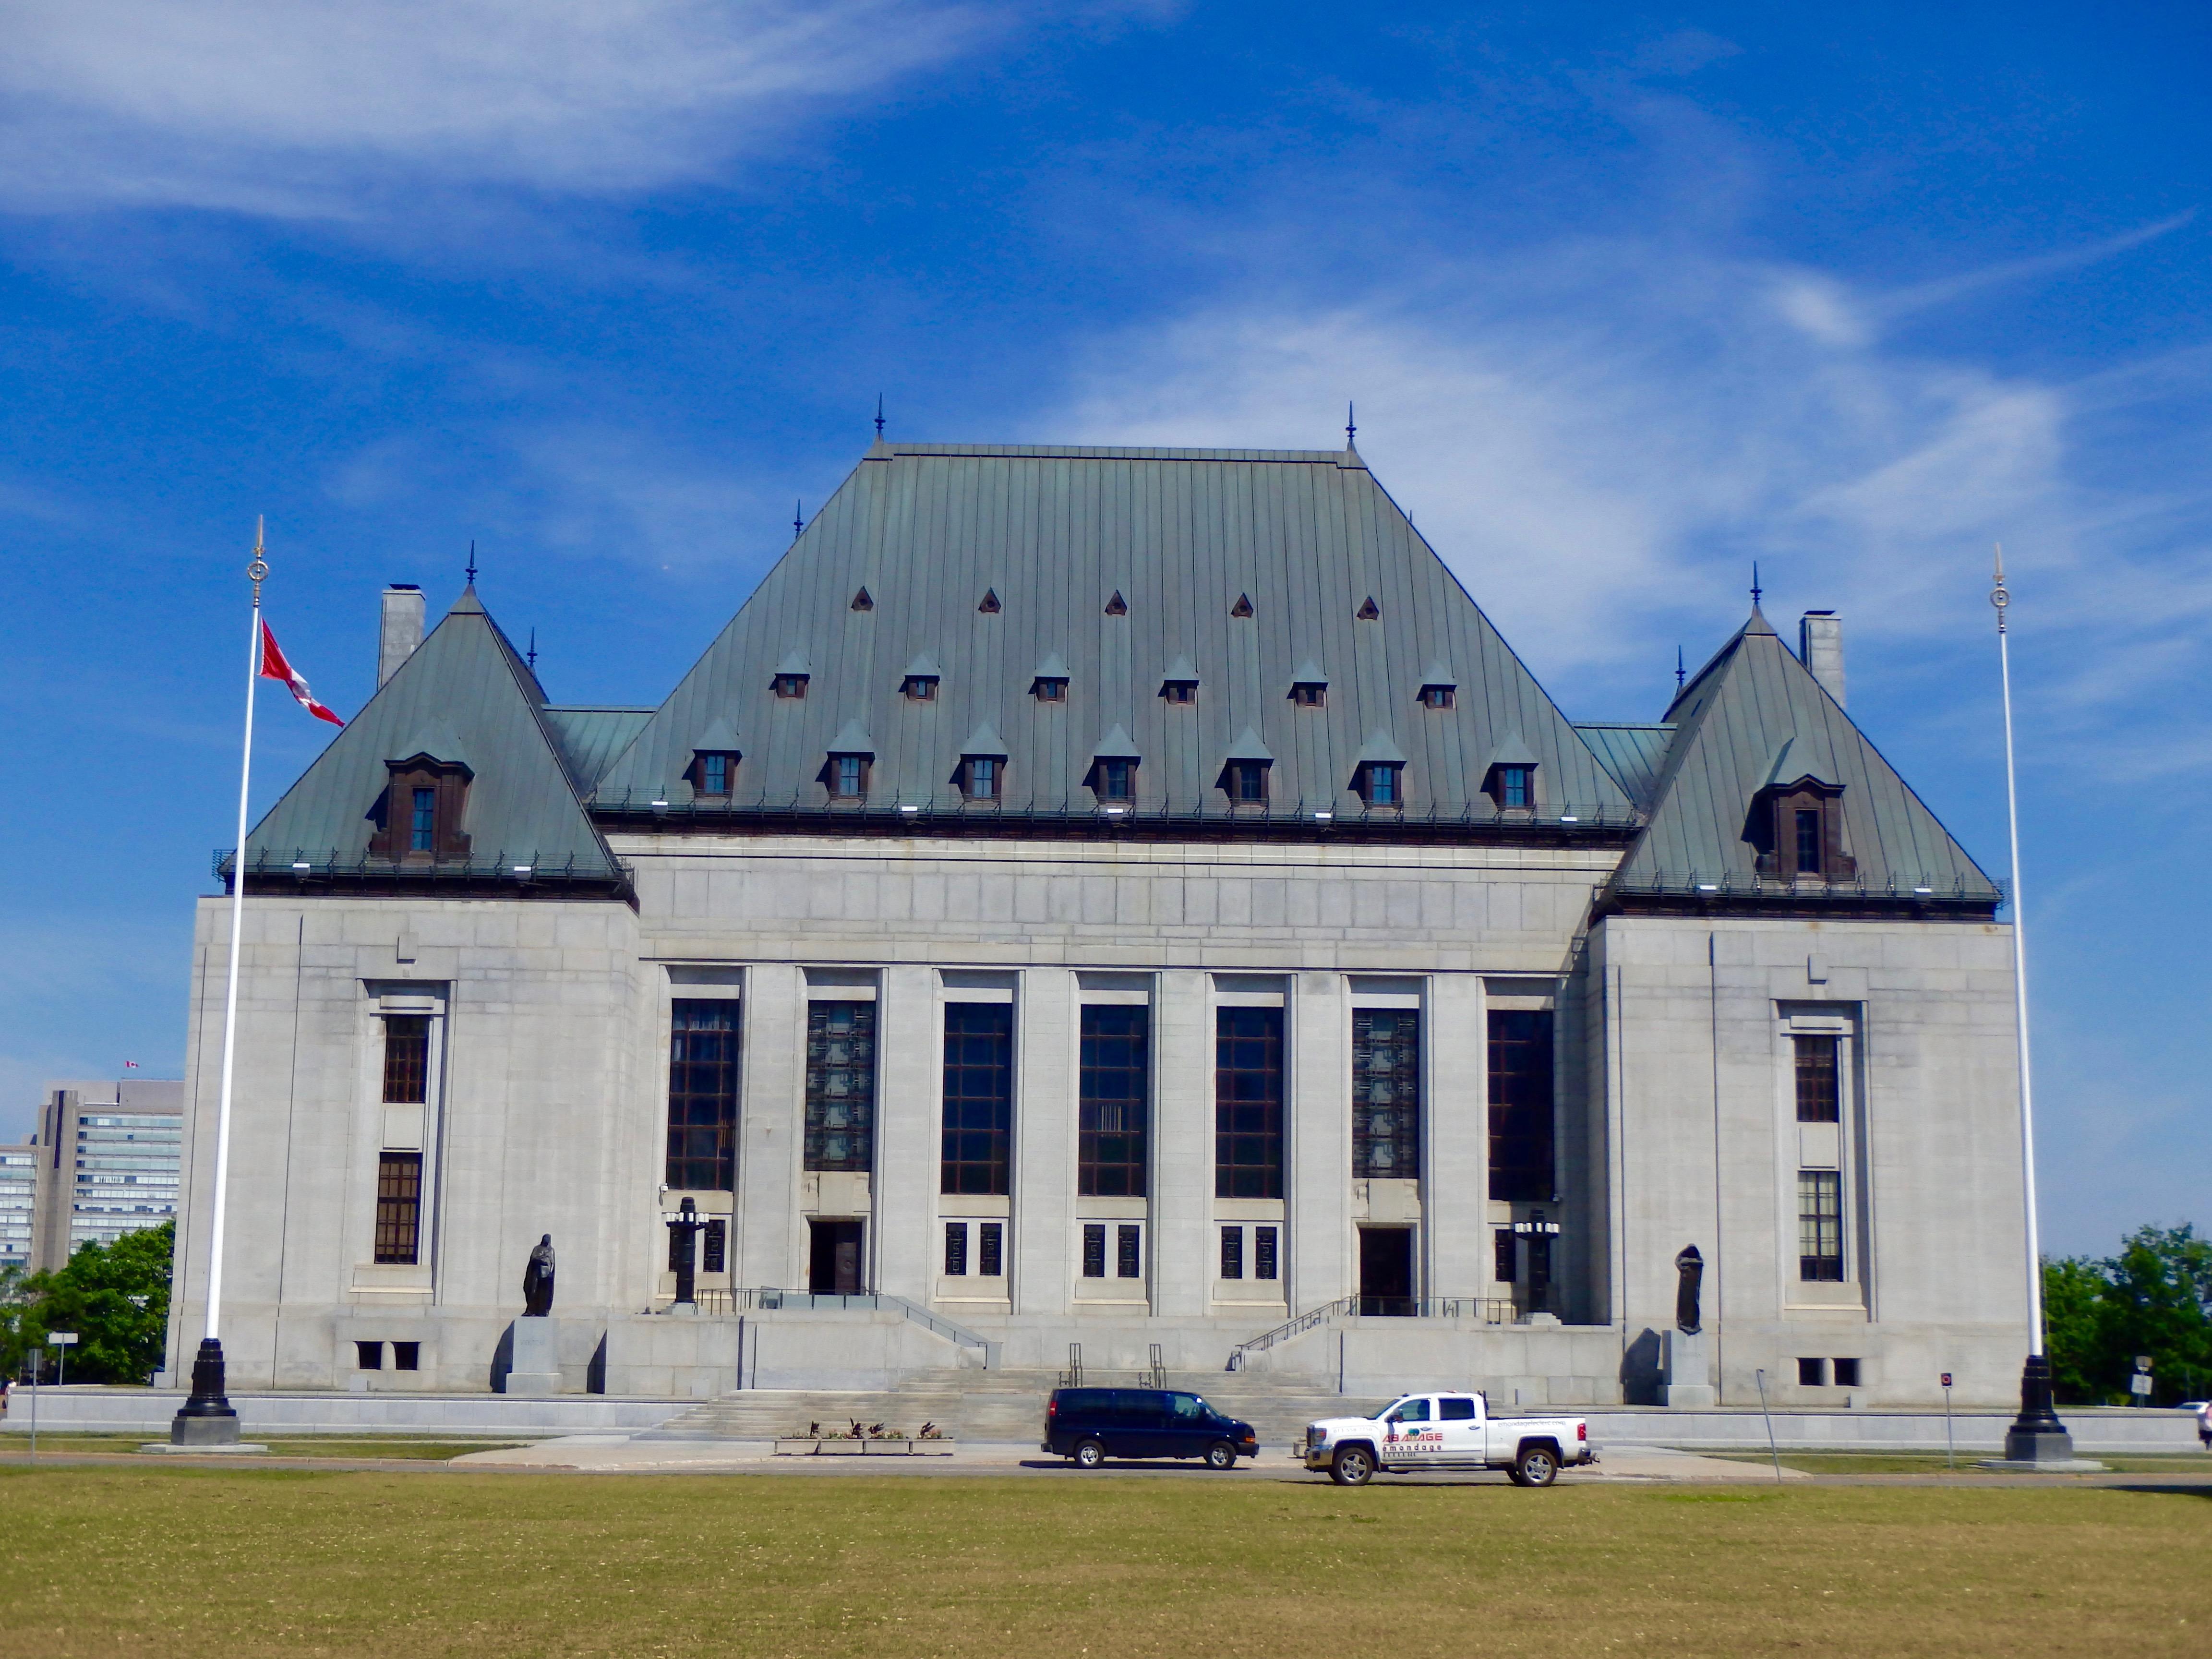 Supreme court of canada ottawa walking tour where to visit in ottawa